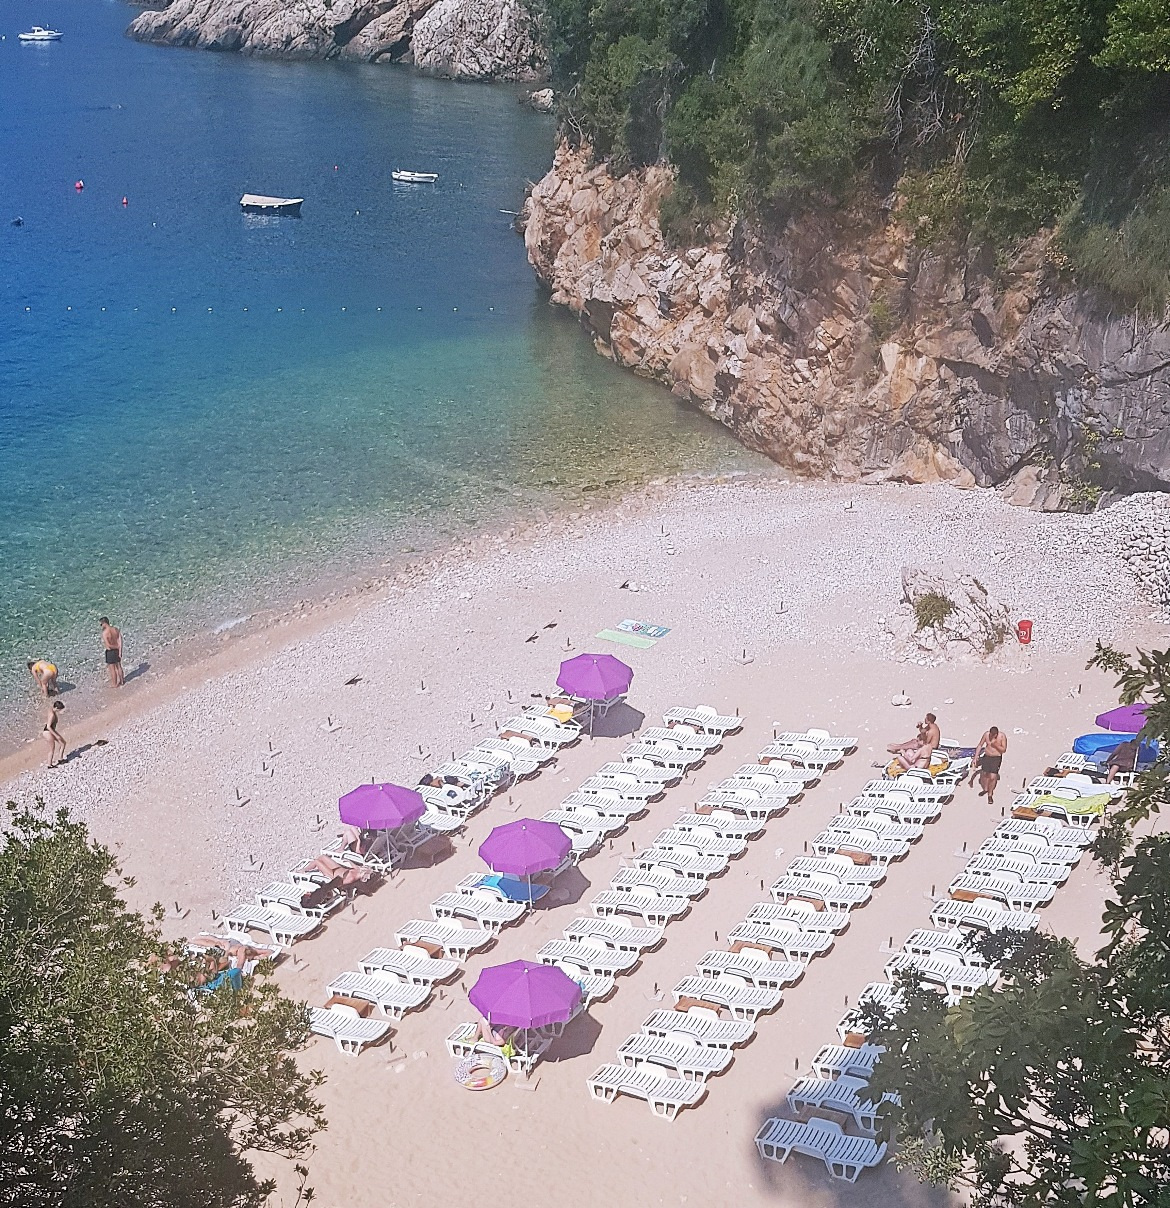 Sveti Jakov beach - Sightseeing in Dubrovnik, Croatia - Top Travel Tips by BeckyBecky Blogs